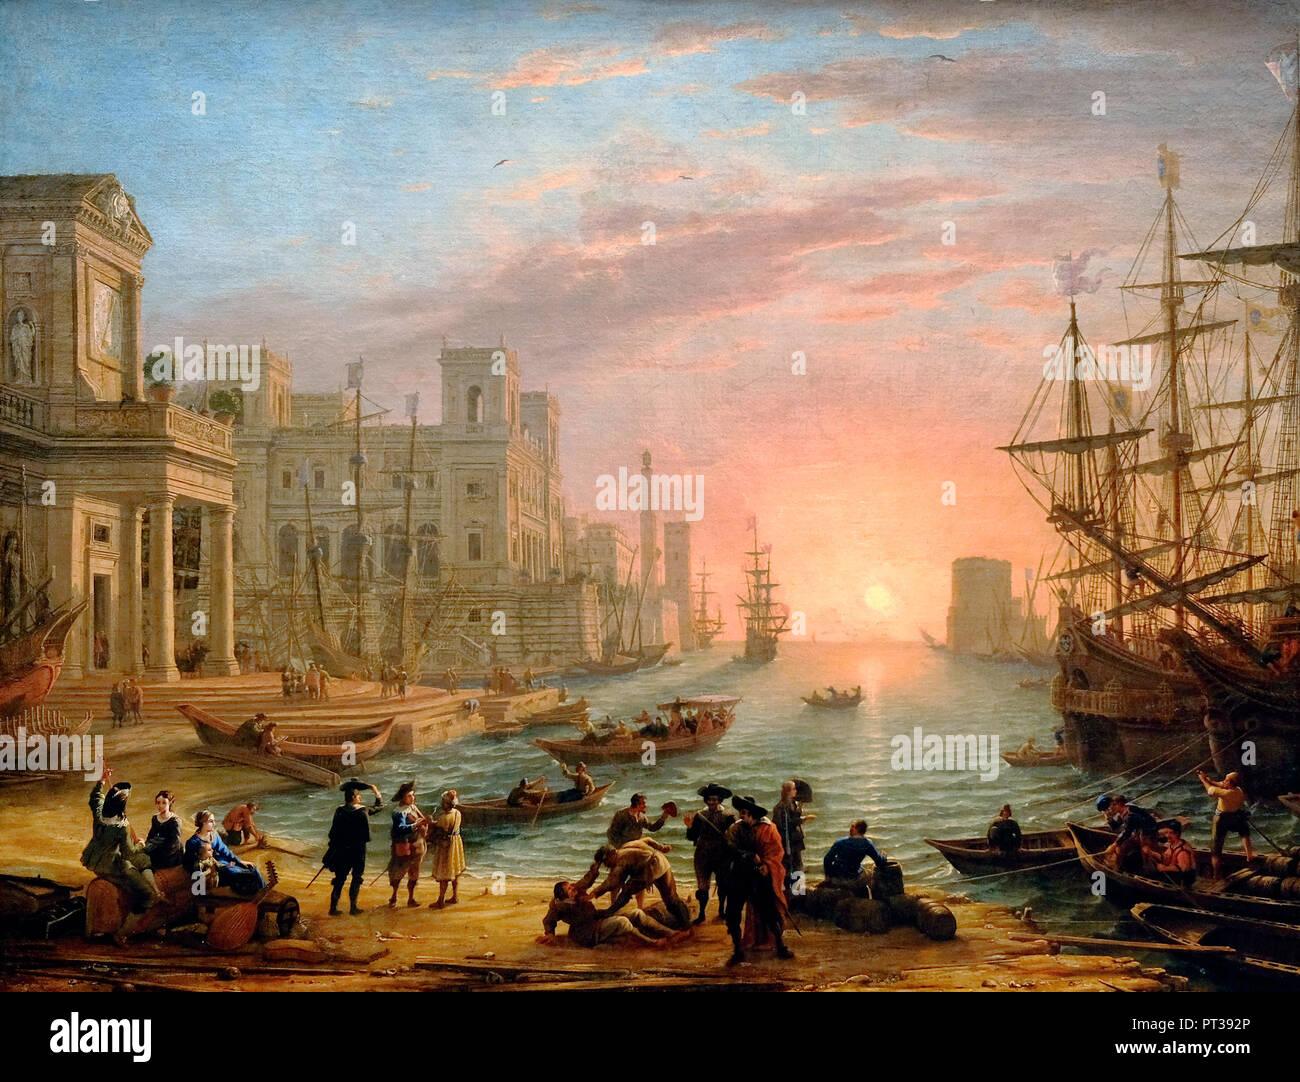 Seaport at sunset - Claude Lorrain, circa 1639 - Stock Image